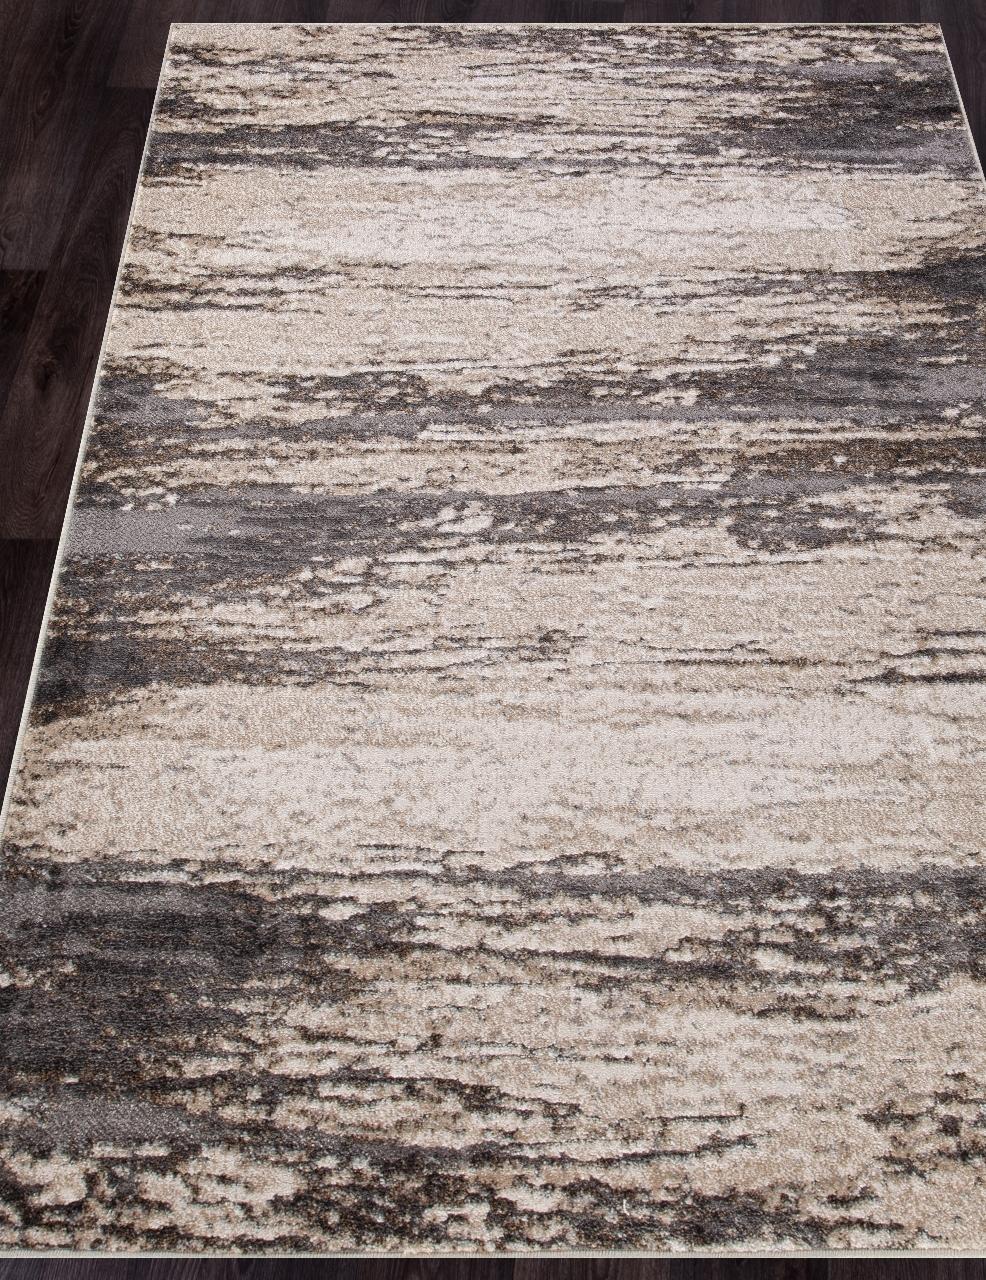 Ковер 4088 - BEIGE-GRAY - Прямоугольник - коллекция IBIZA - фото 1